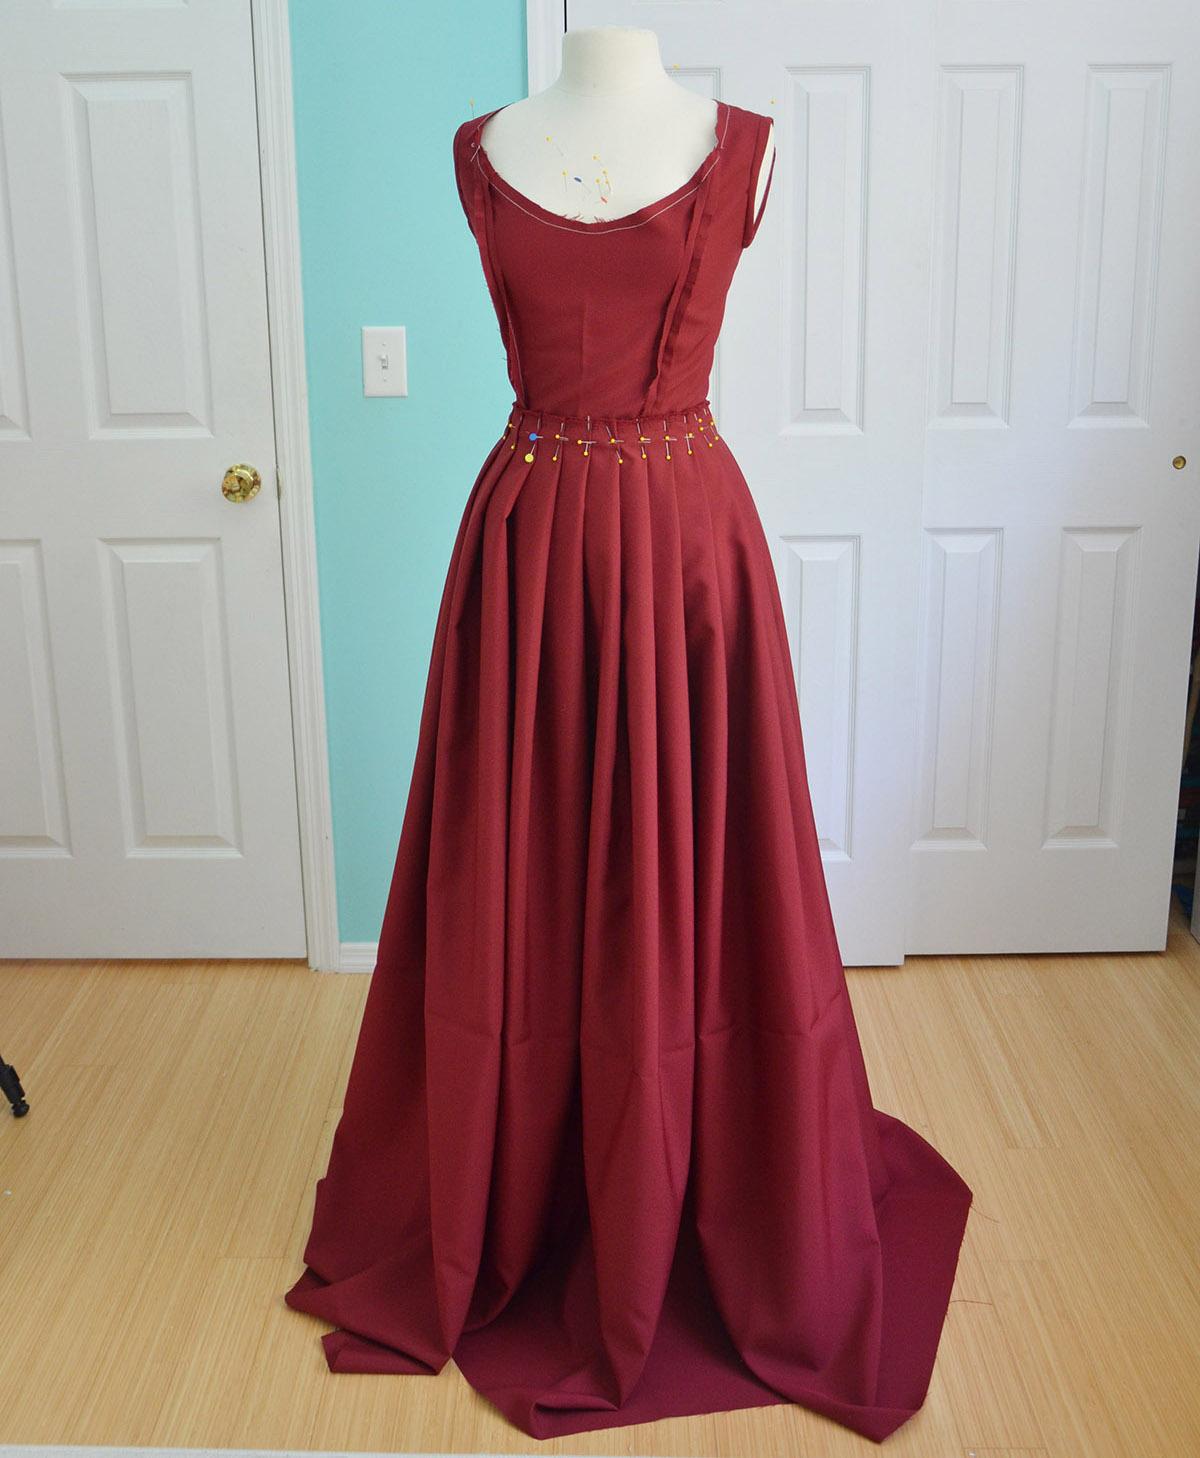 6f4cacea0 Heinrich Mücke Inspired Dress